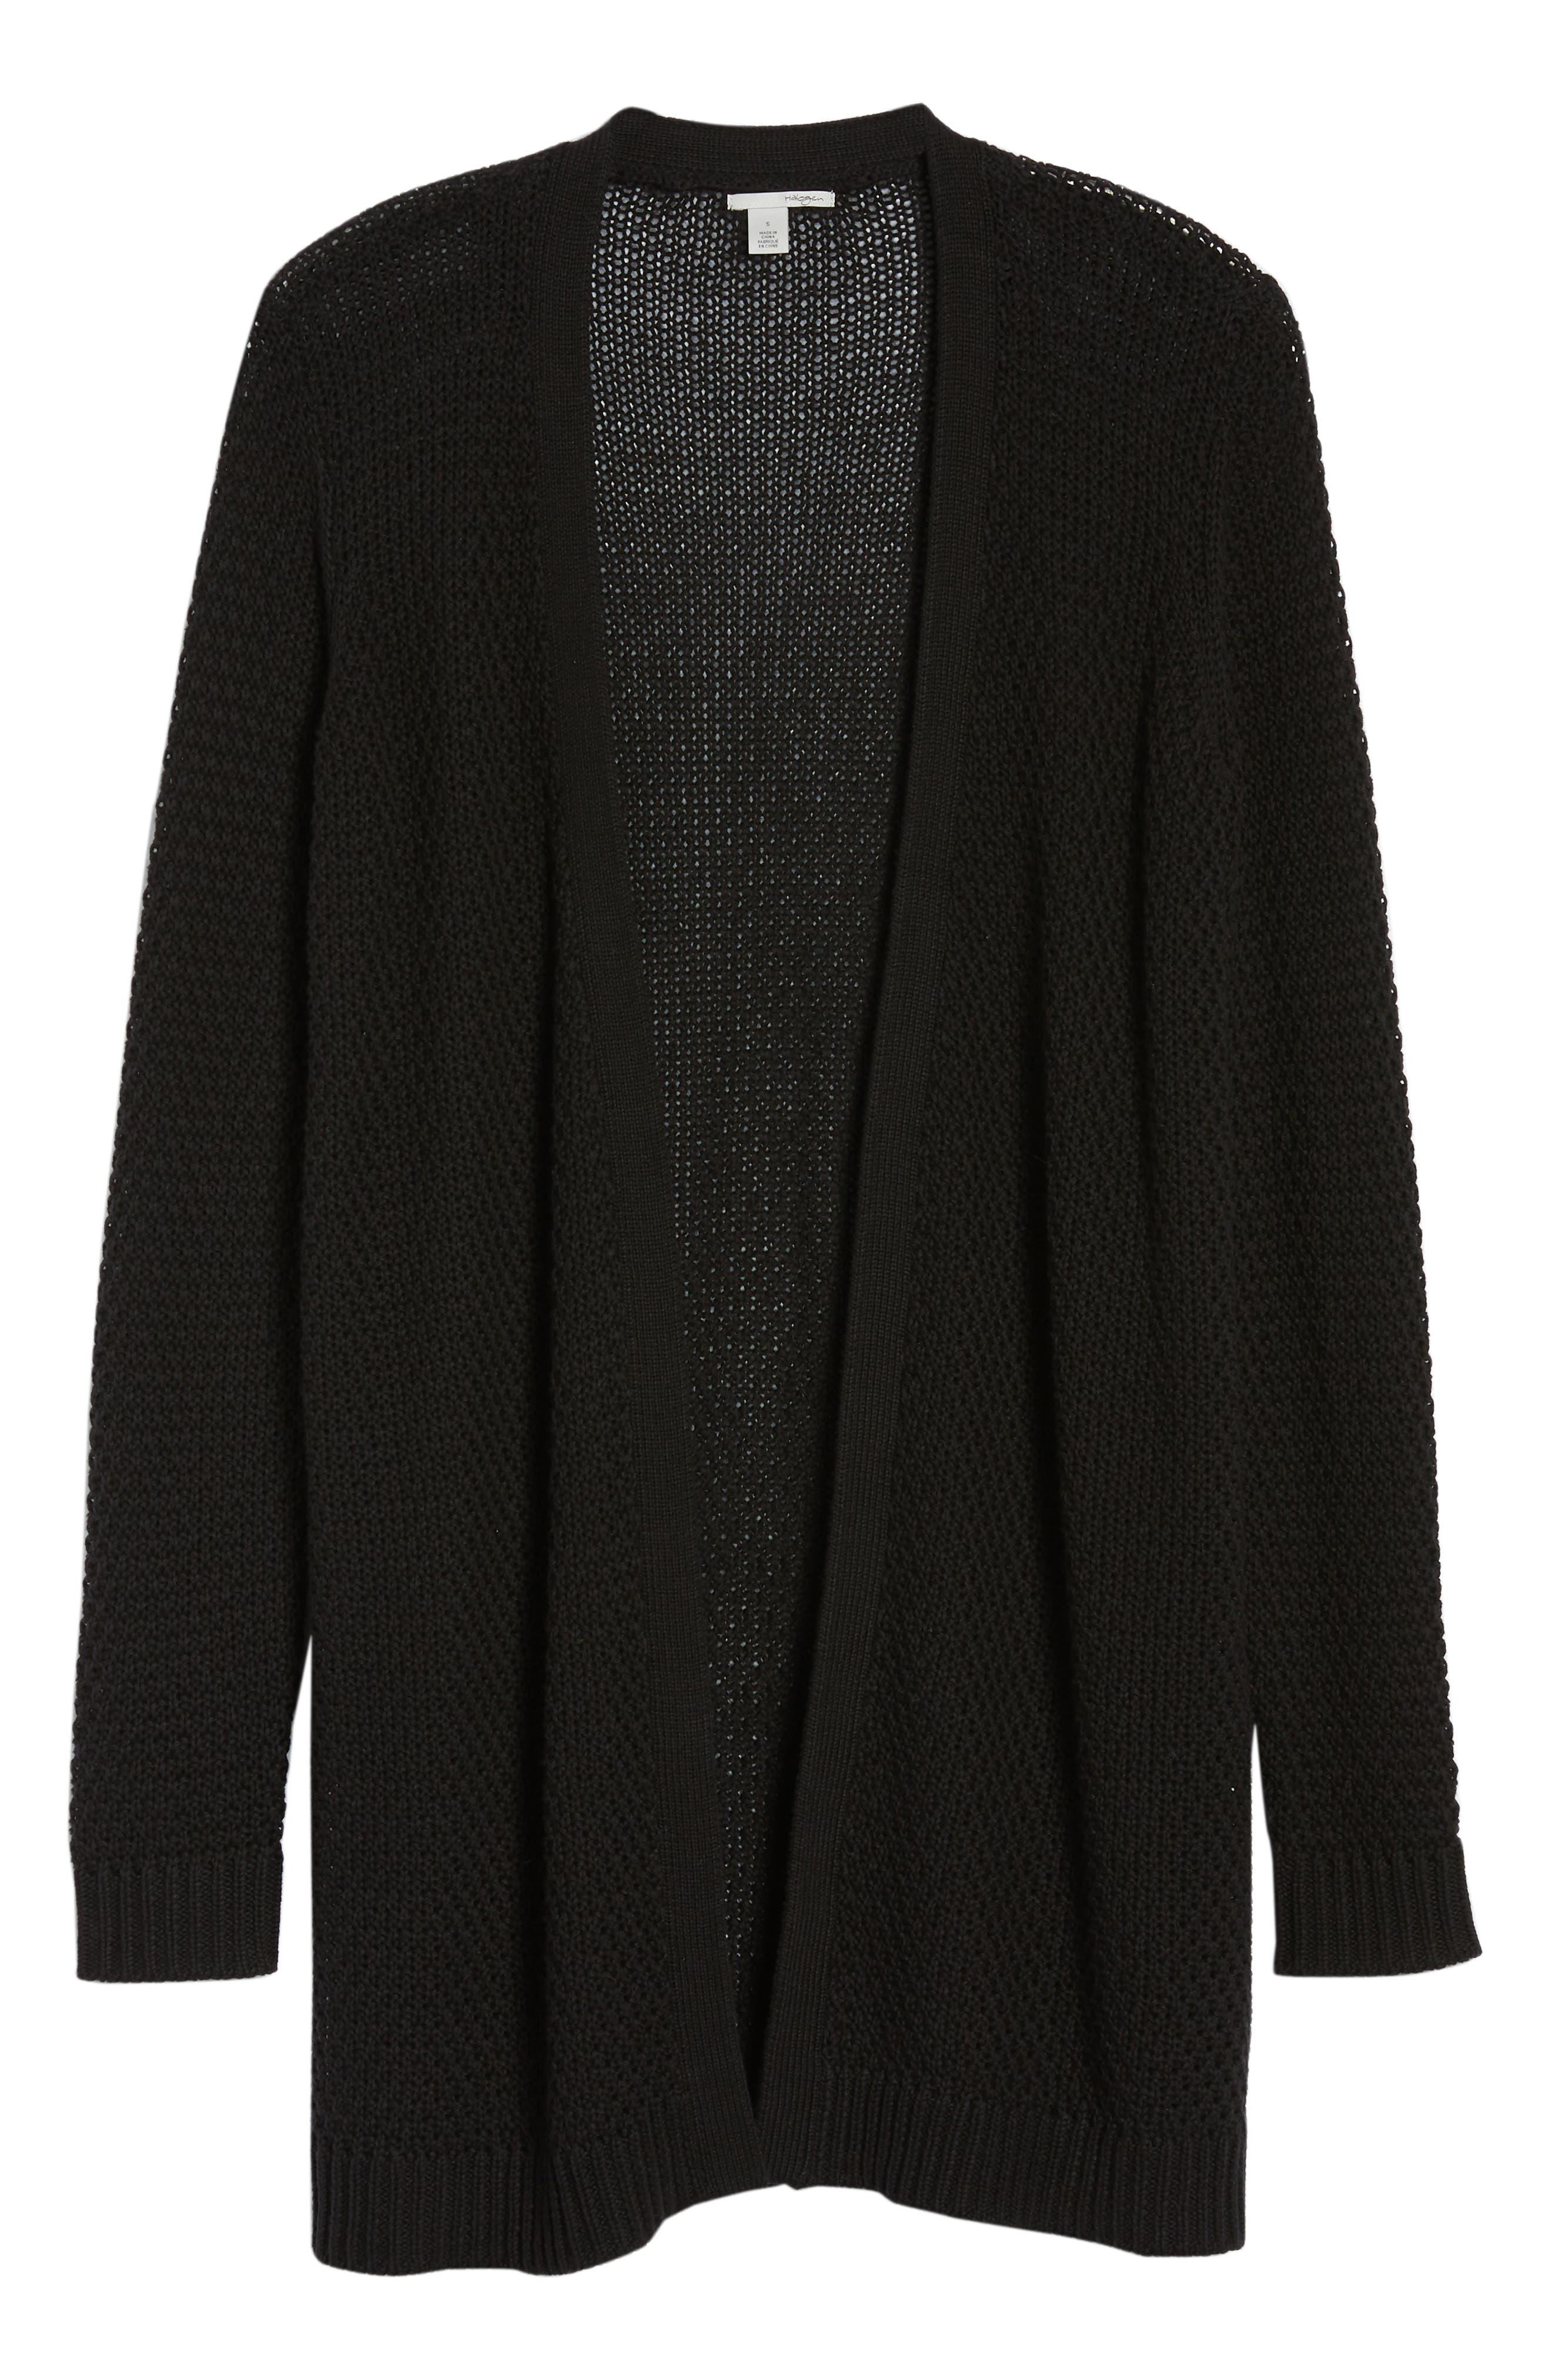 Textured Cotton Knit Cardigan,                             Alternate thumbnail 7, color,                             BLACK